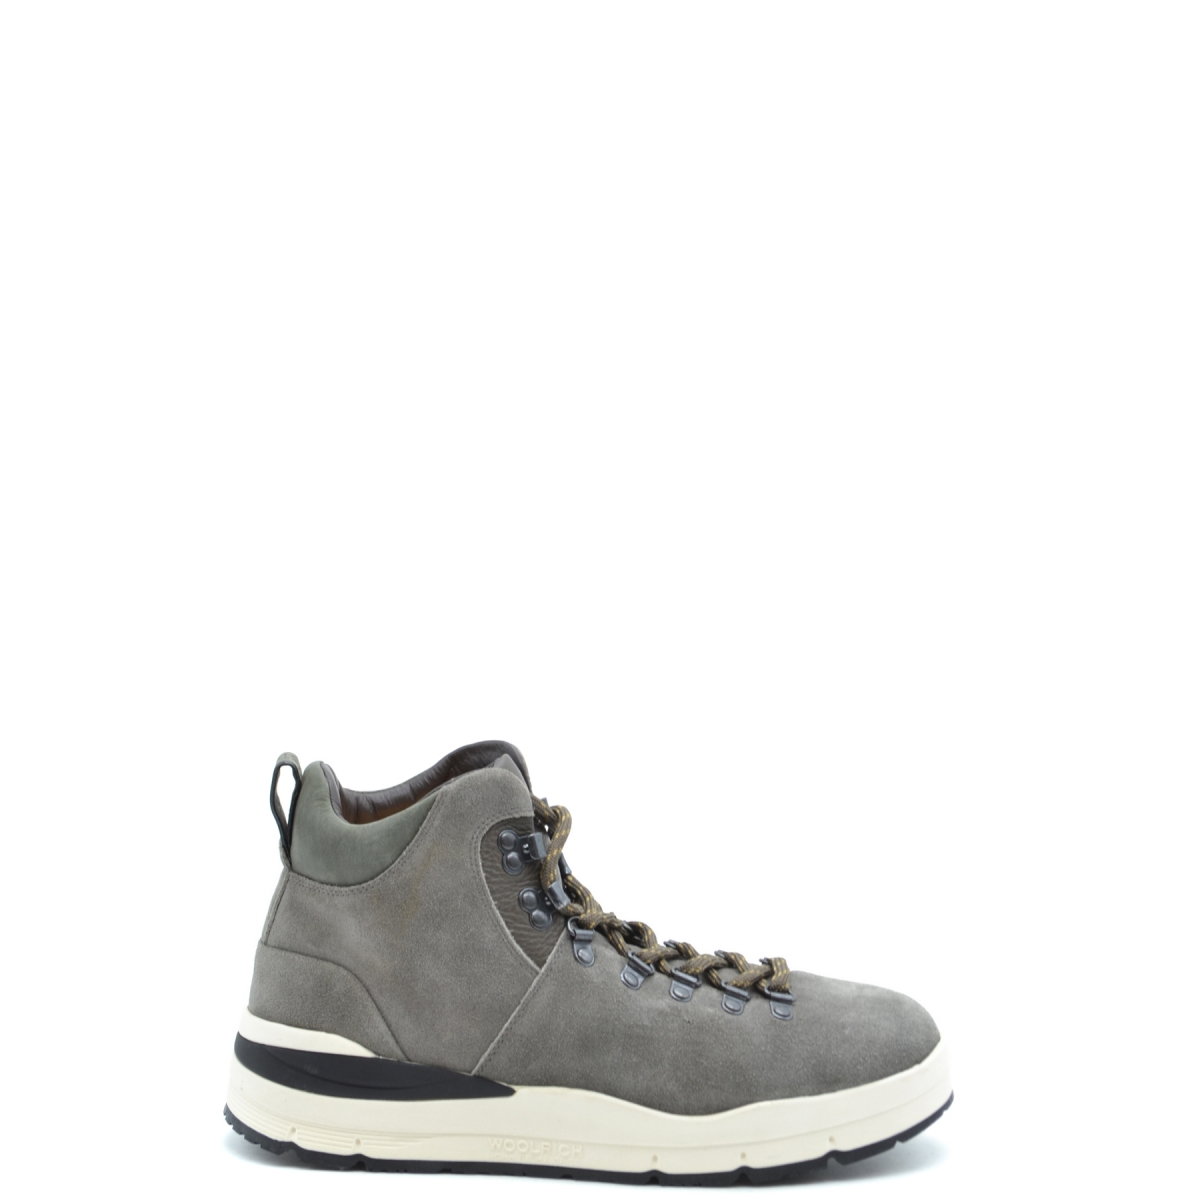 scarpe da ginnastica alte Woolrich 37655IT -20%